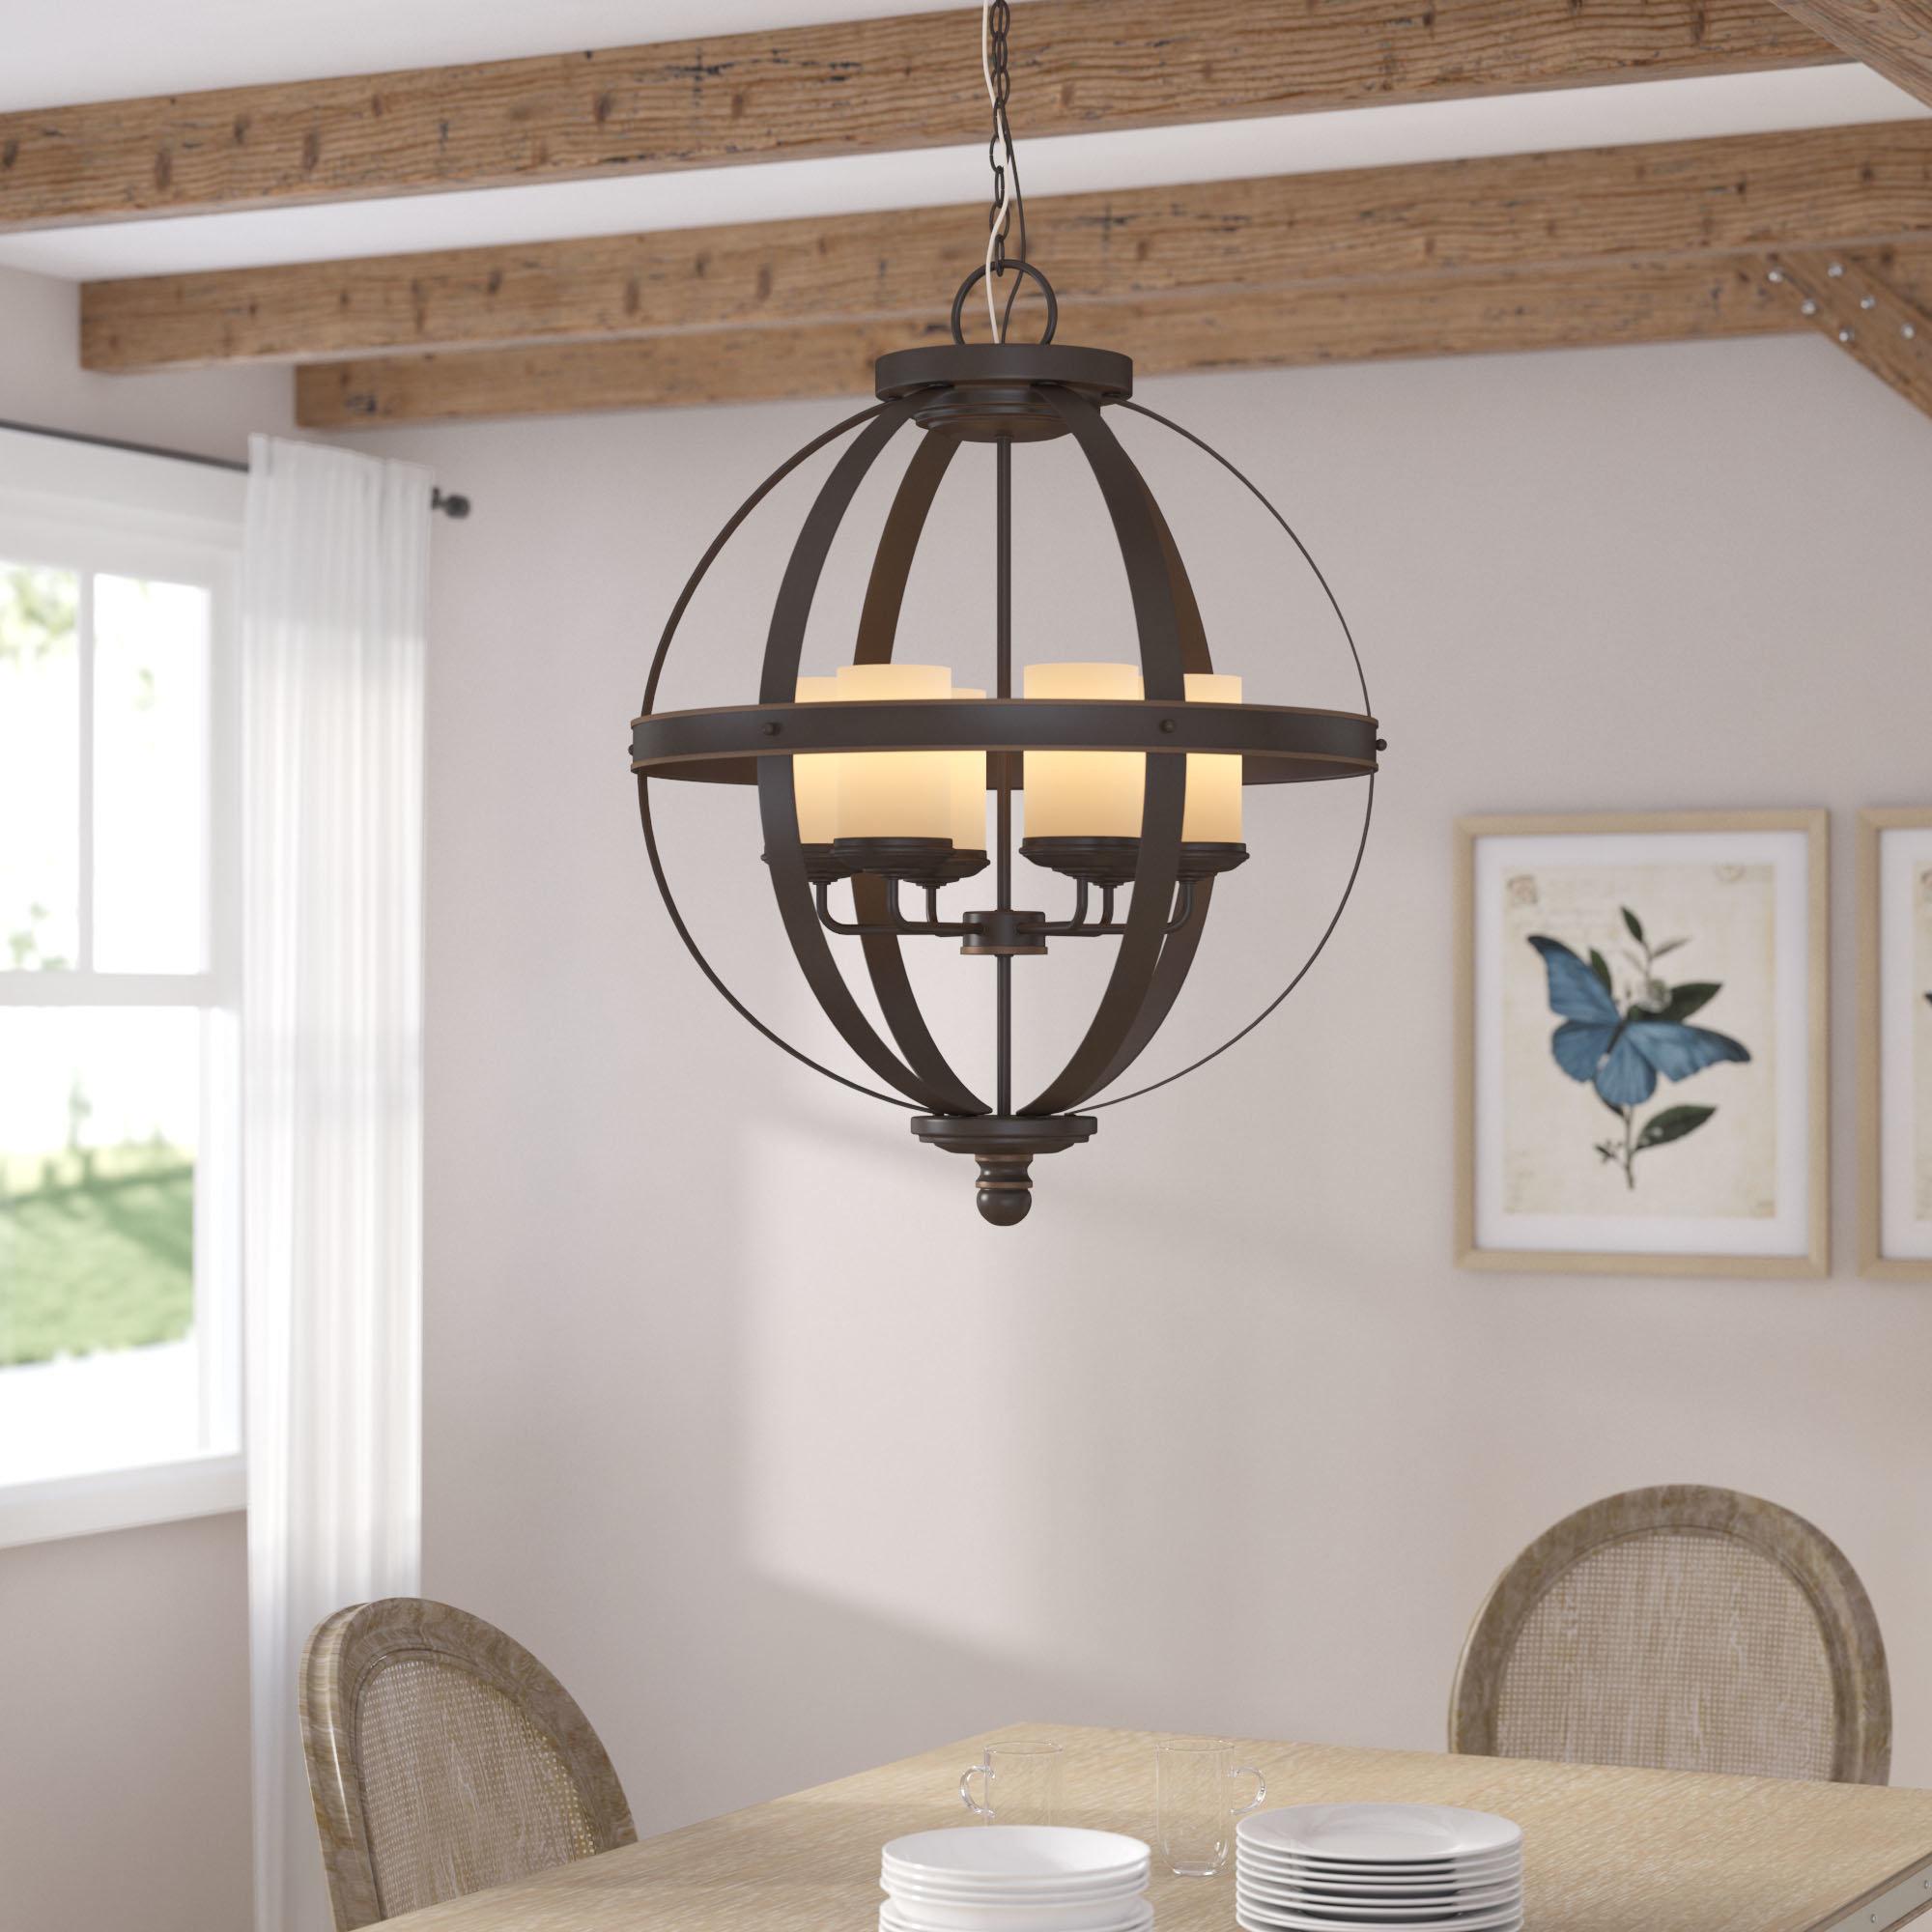 Donna 6-Light Globe Chandelier with regard to Donna 6-Light Globe Chandeliers (Image 11 of 30)